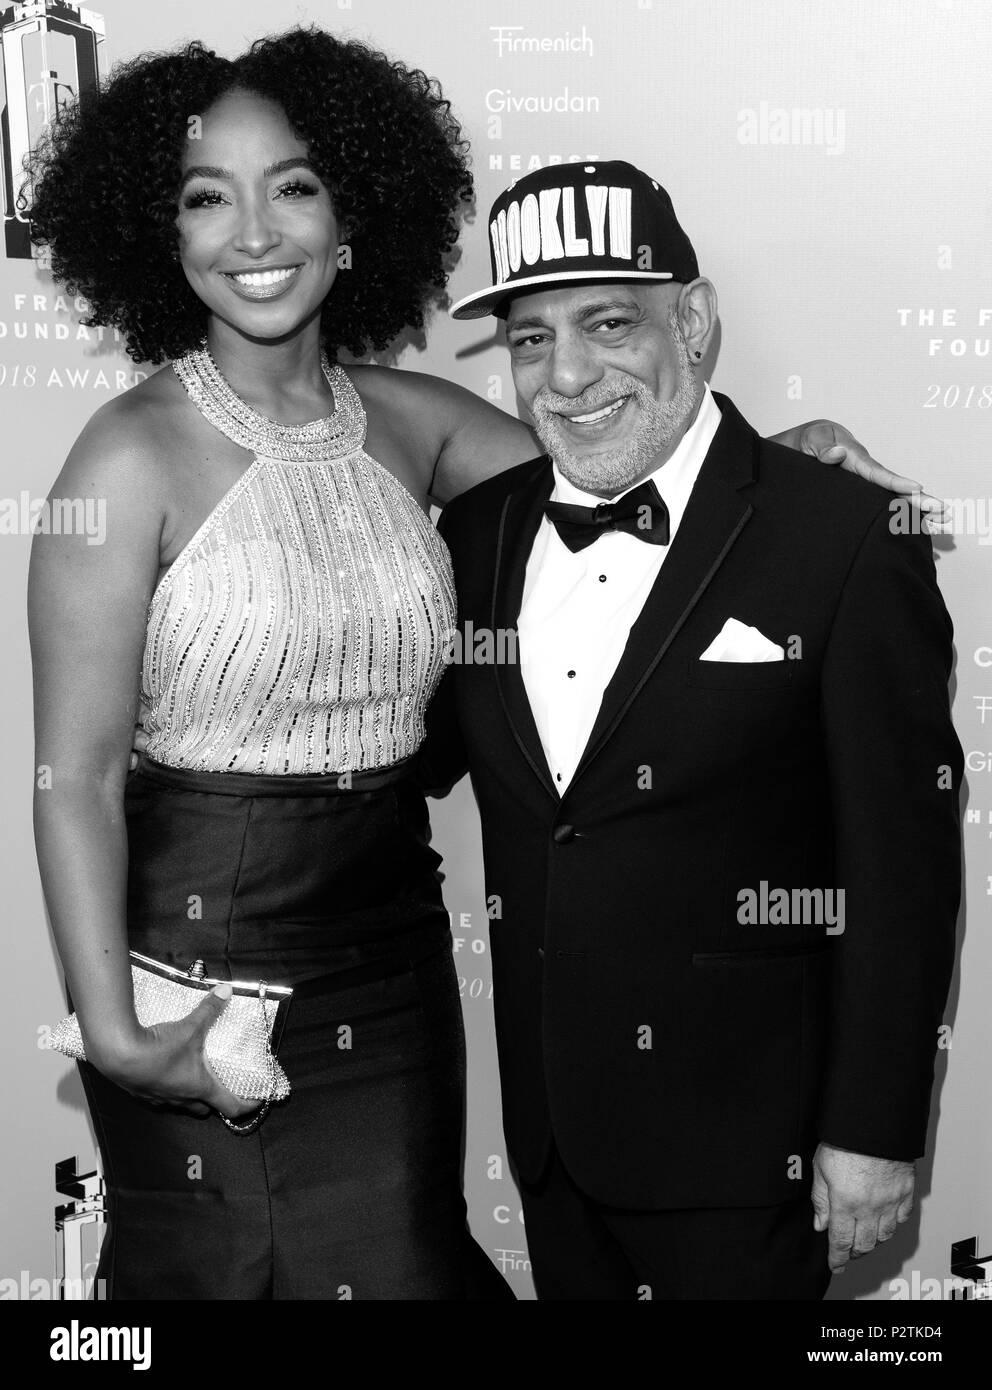 New York, NY - 12. Juni 2018: Tiff Benson und Carlos Powell besuchen 2018 Fragrance Foundation Awards in der Alice Tully Hall im Lincoln Center Stockbild